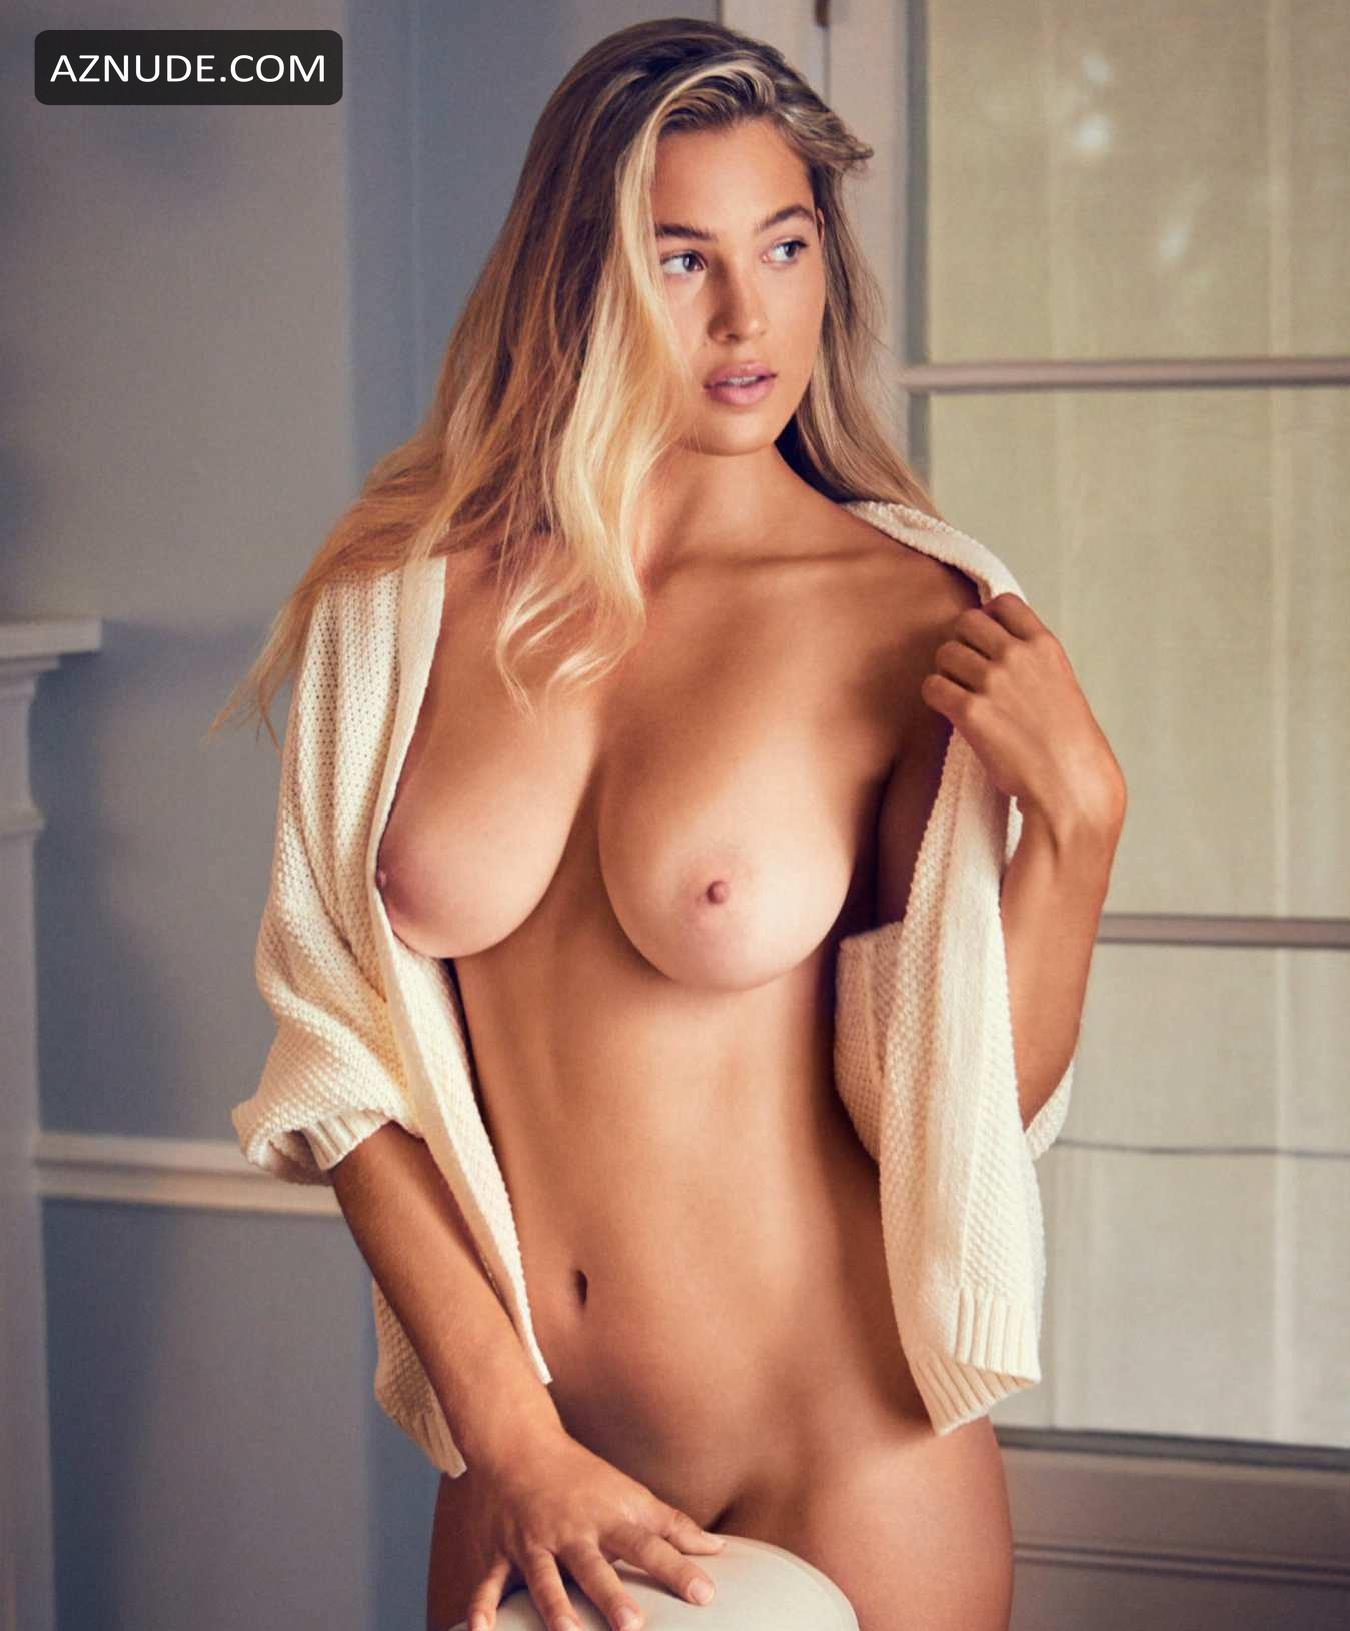 Share Porno bikini more agree